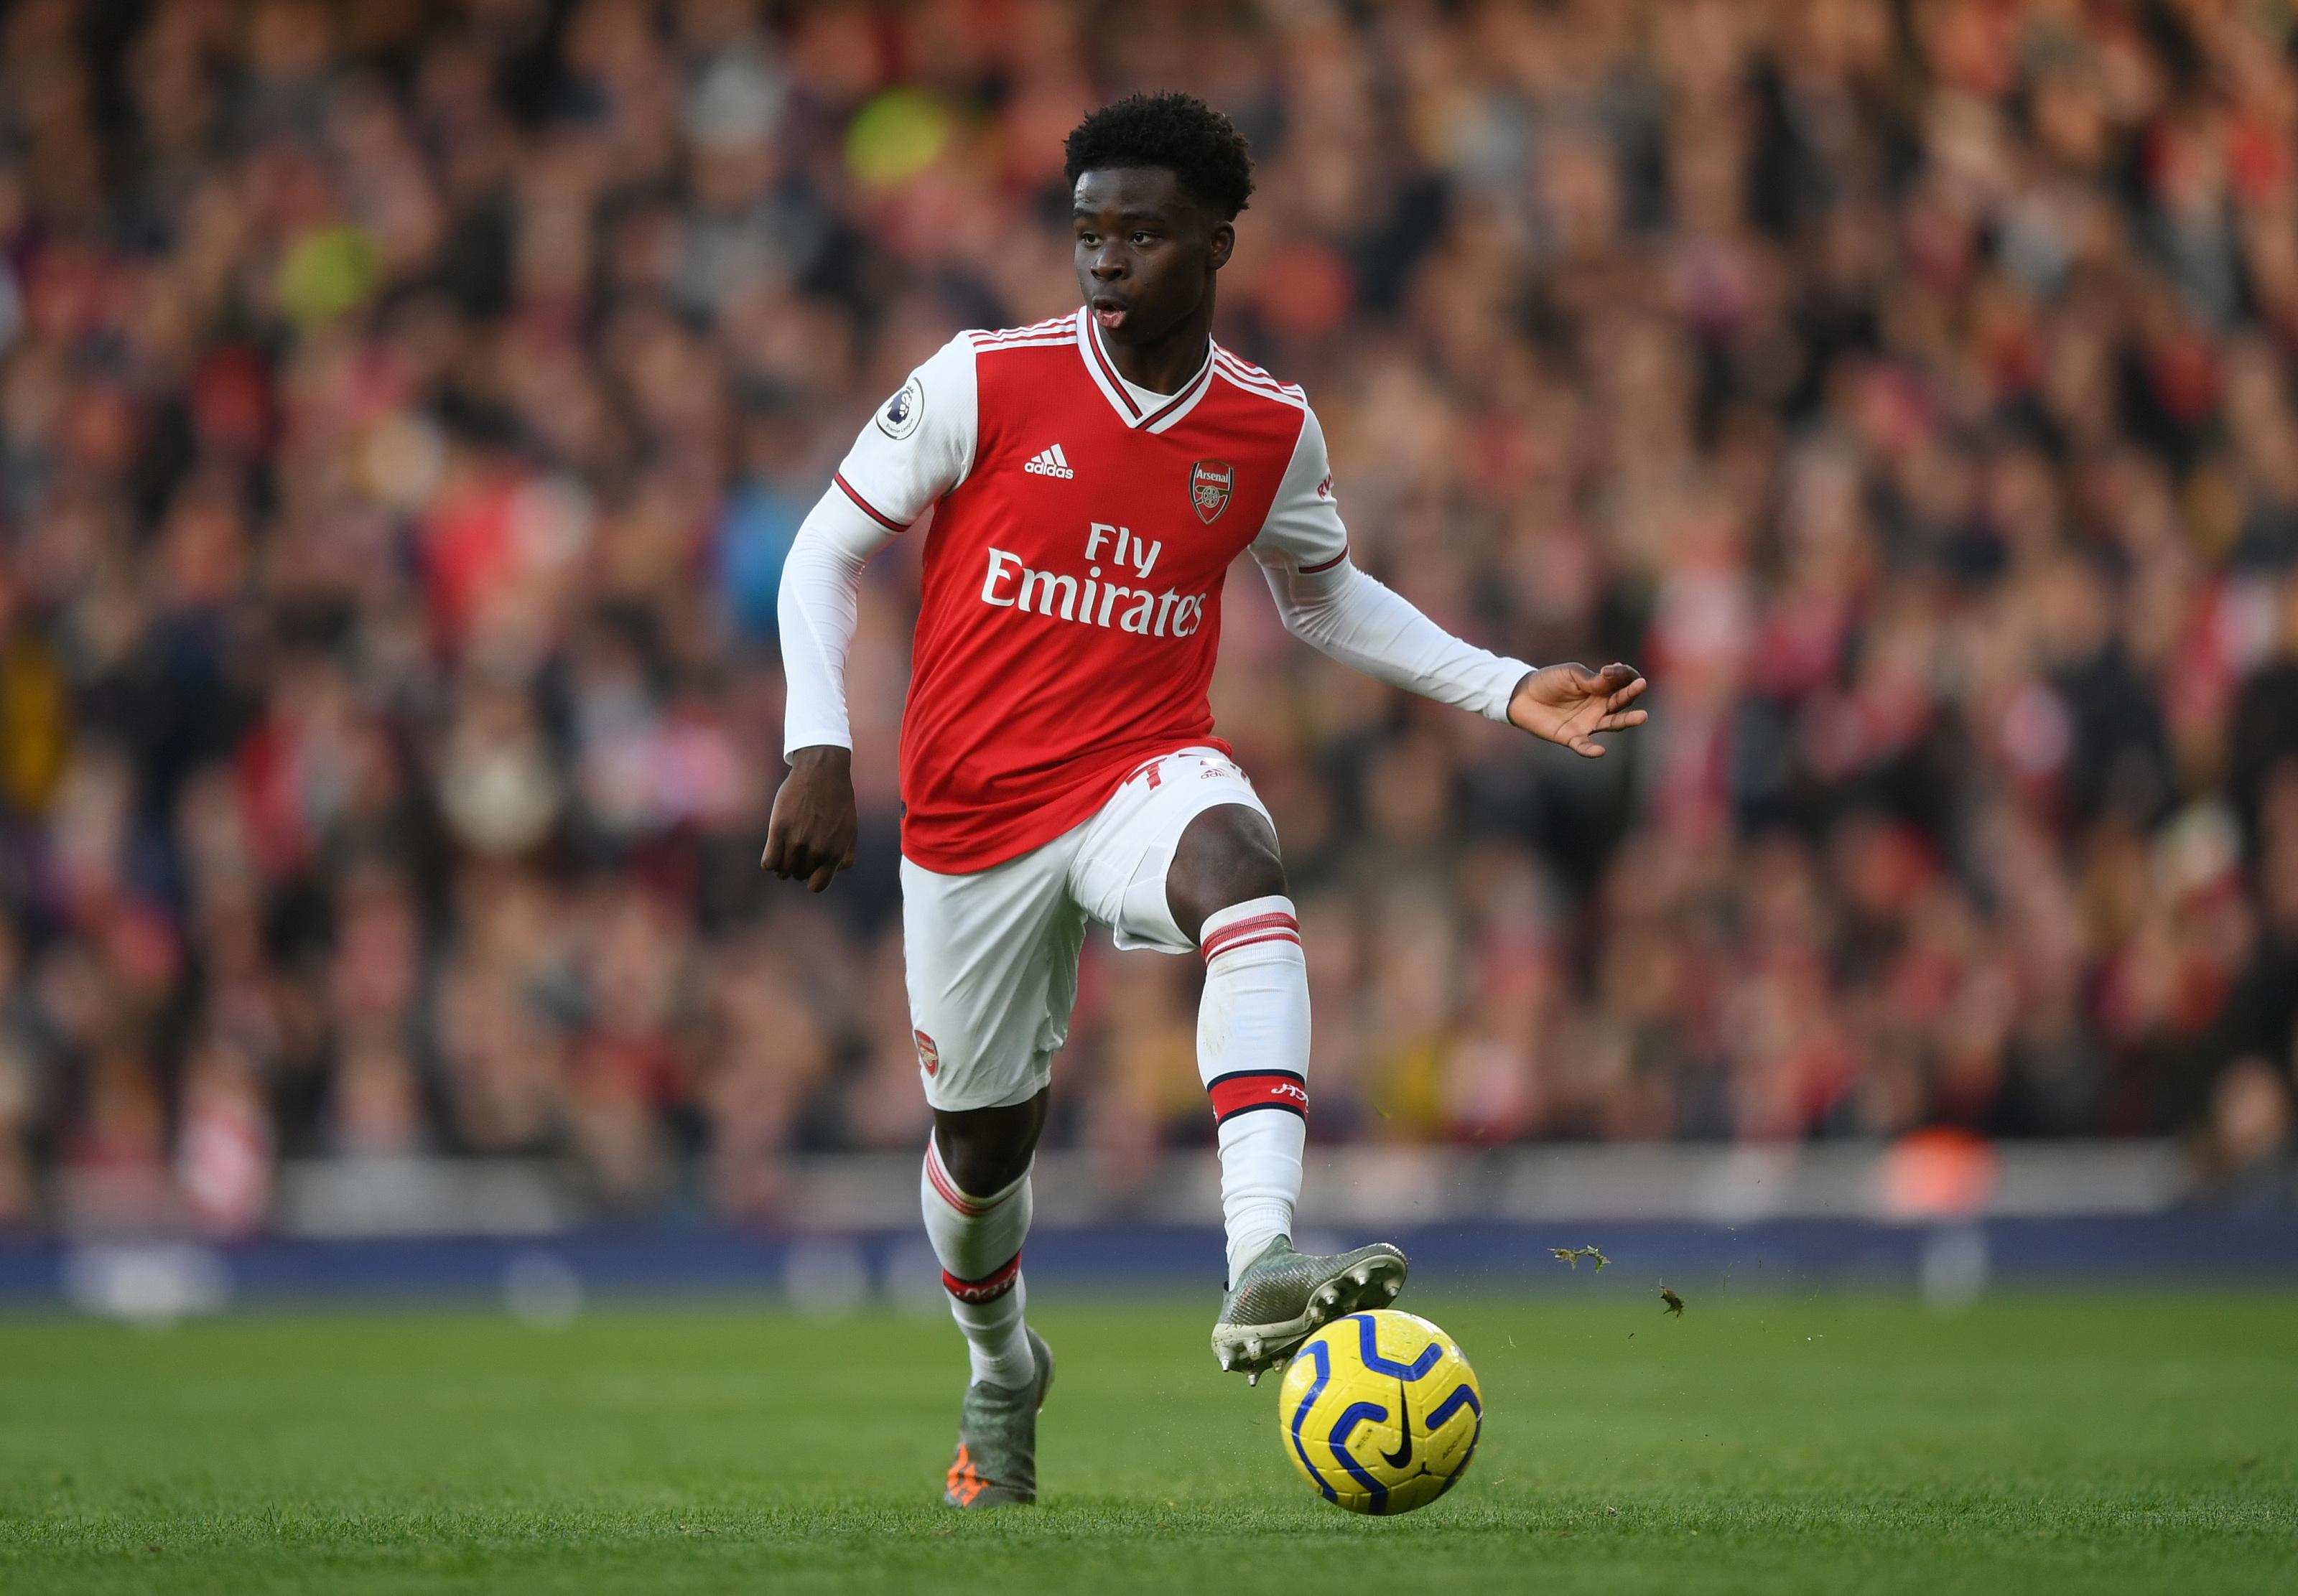 Arsenal: Bukayo Saka hype waiting on one thing and one thing only